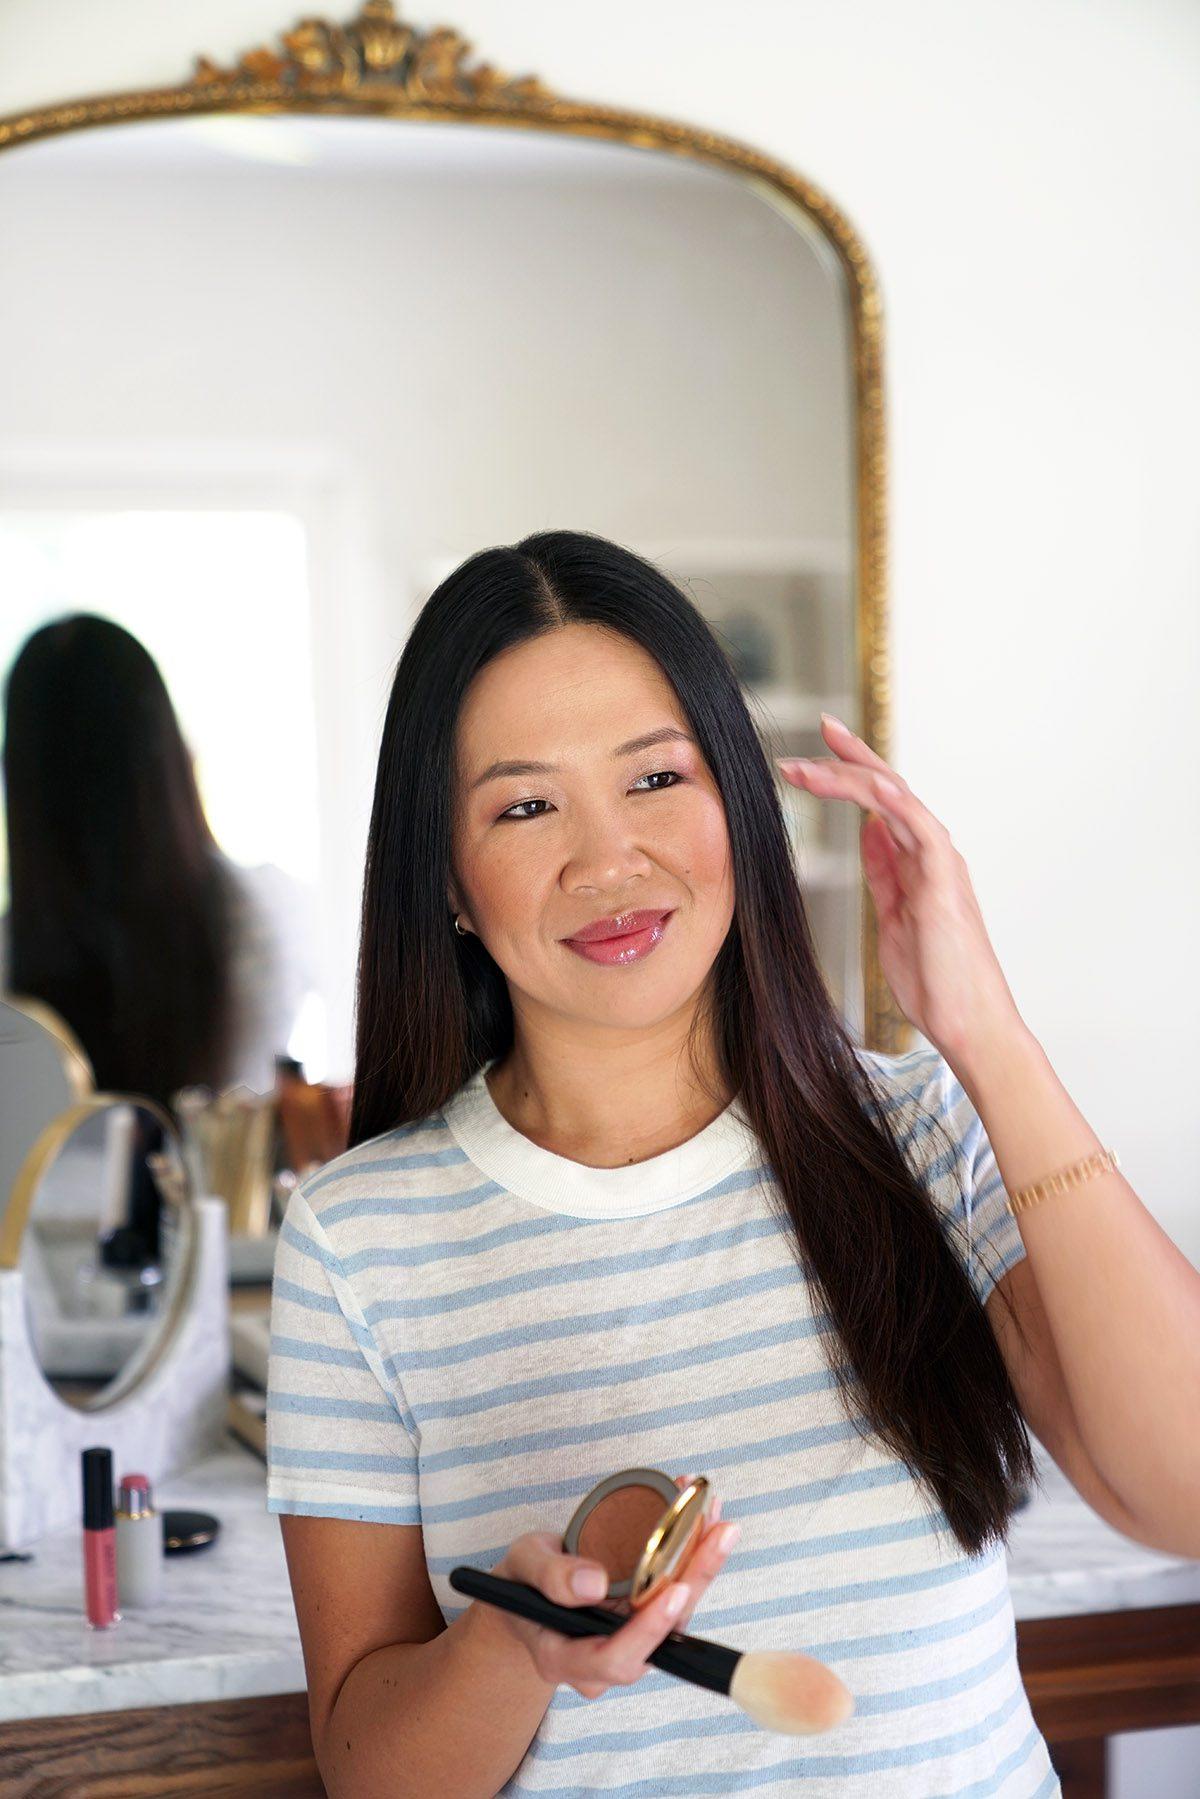 Westman Atelier Beauty Butter Powder Bronzer Coup de Soleil